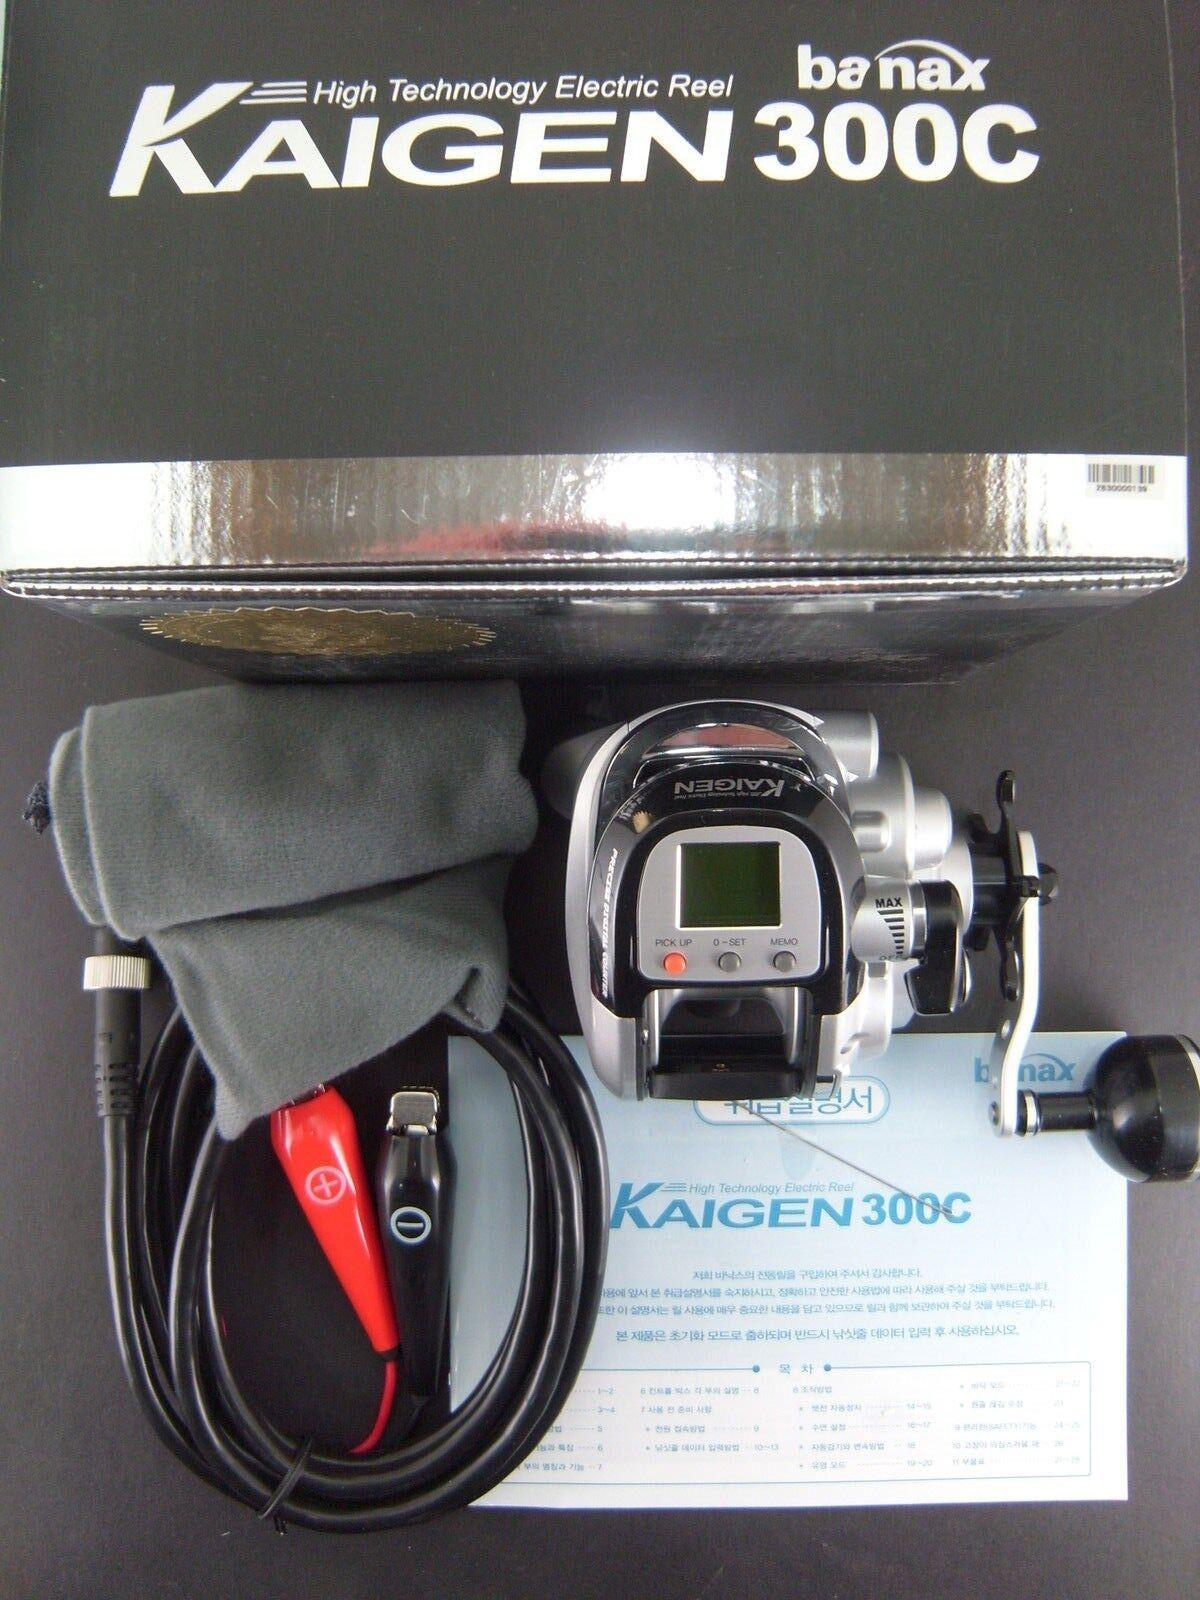 2015 Brand New Banax Kaigen 300C High Technology Electric Fishing Reel